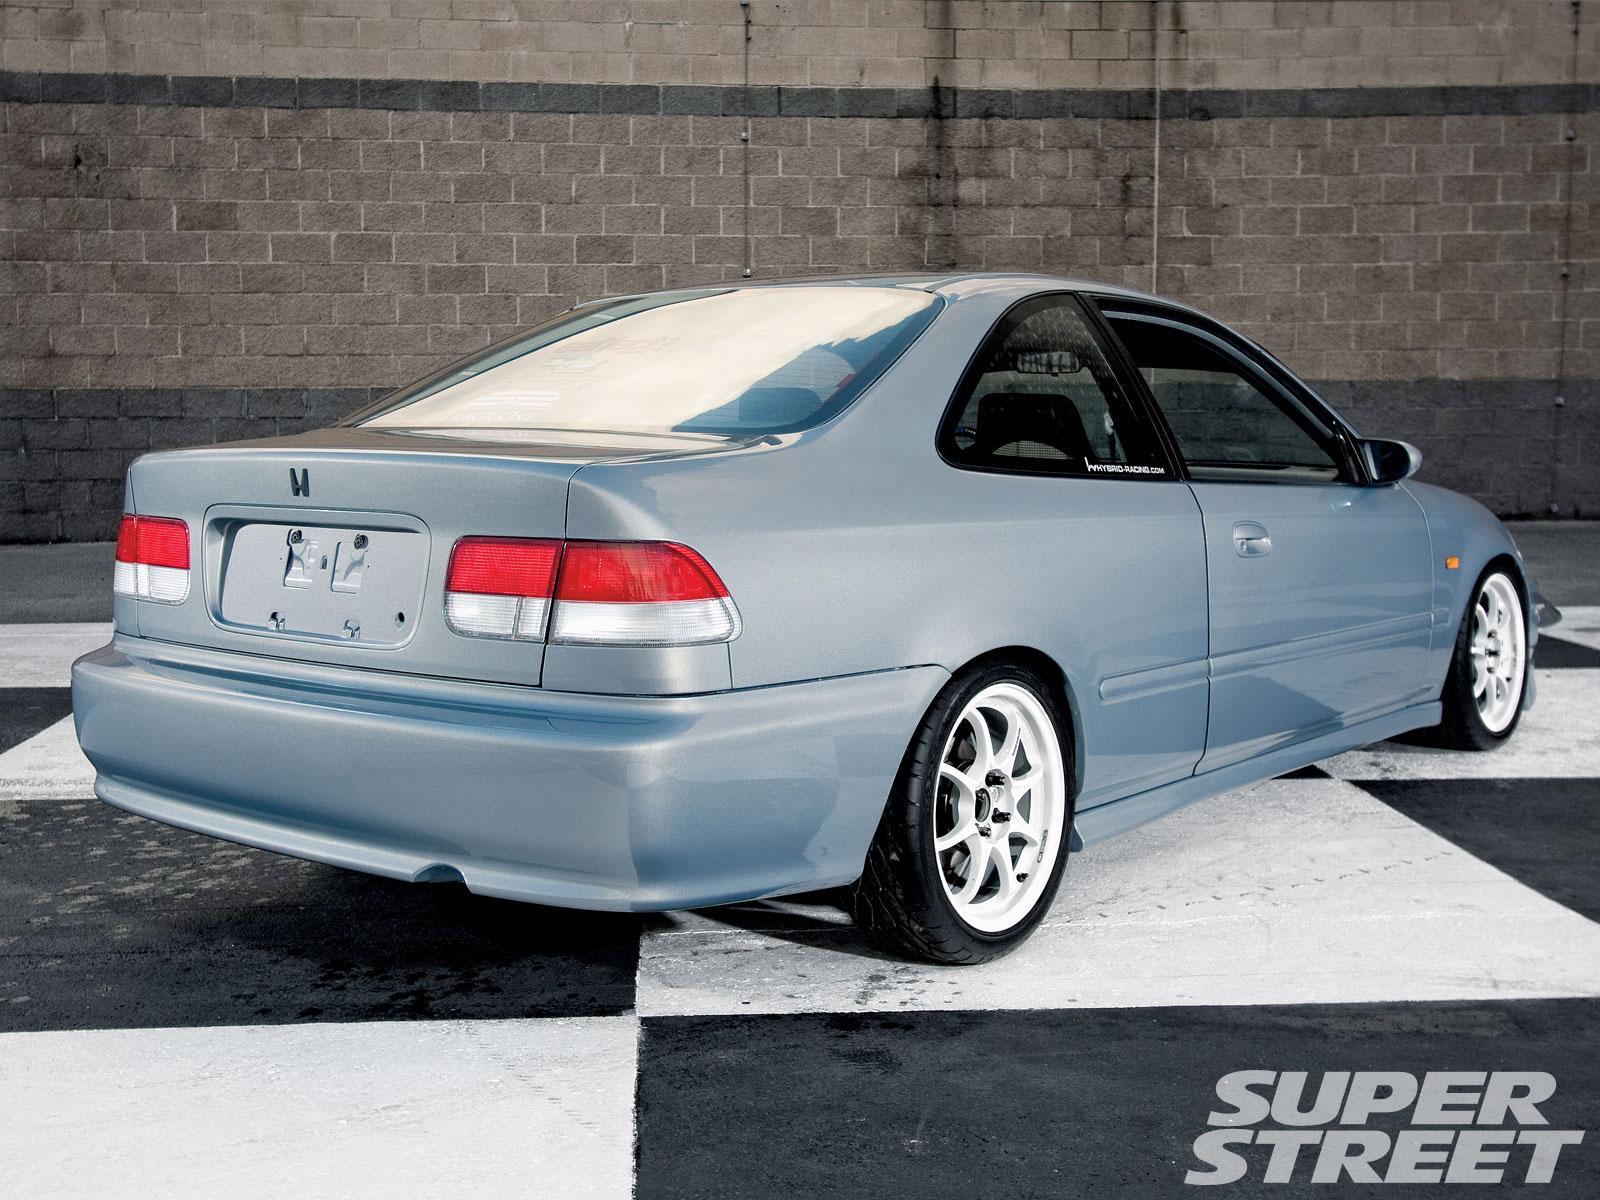 1997 Honda Civic - Information and photos - Zomb Drive Import Tuner Civic